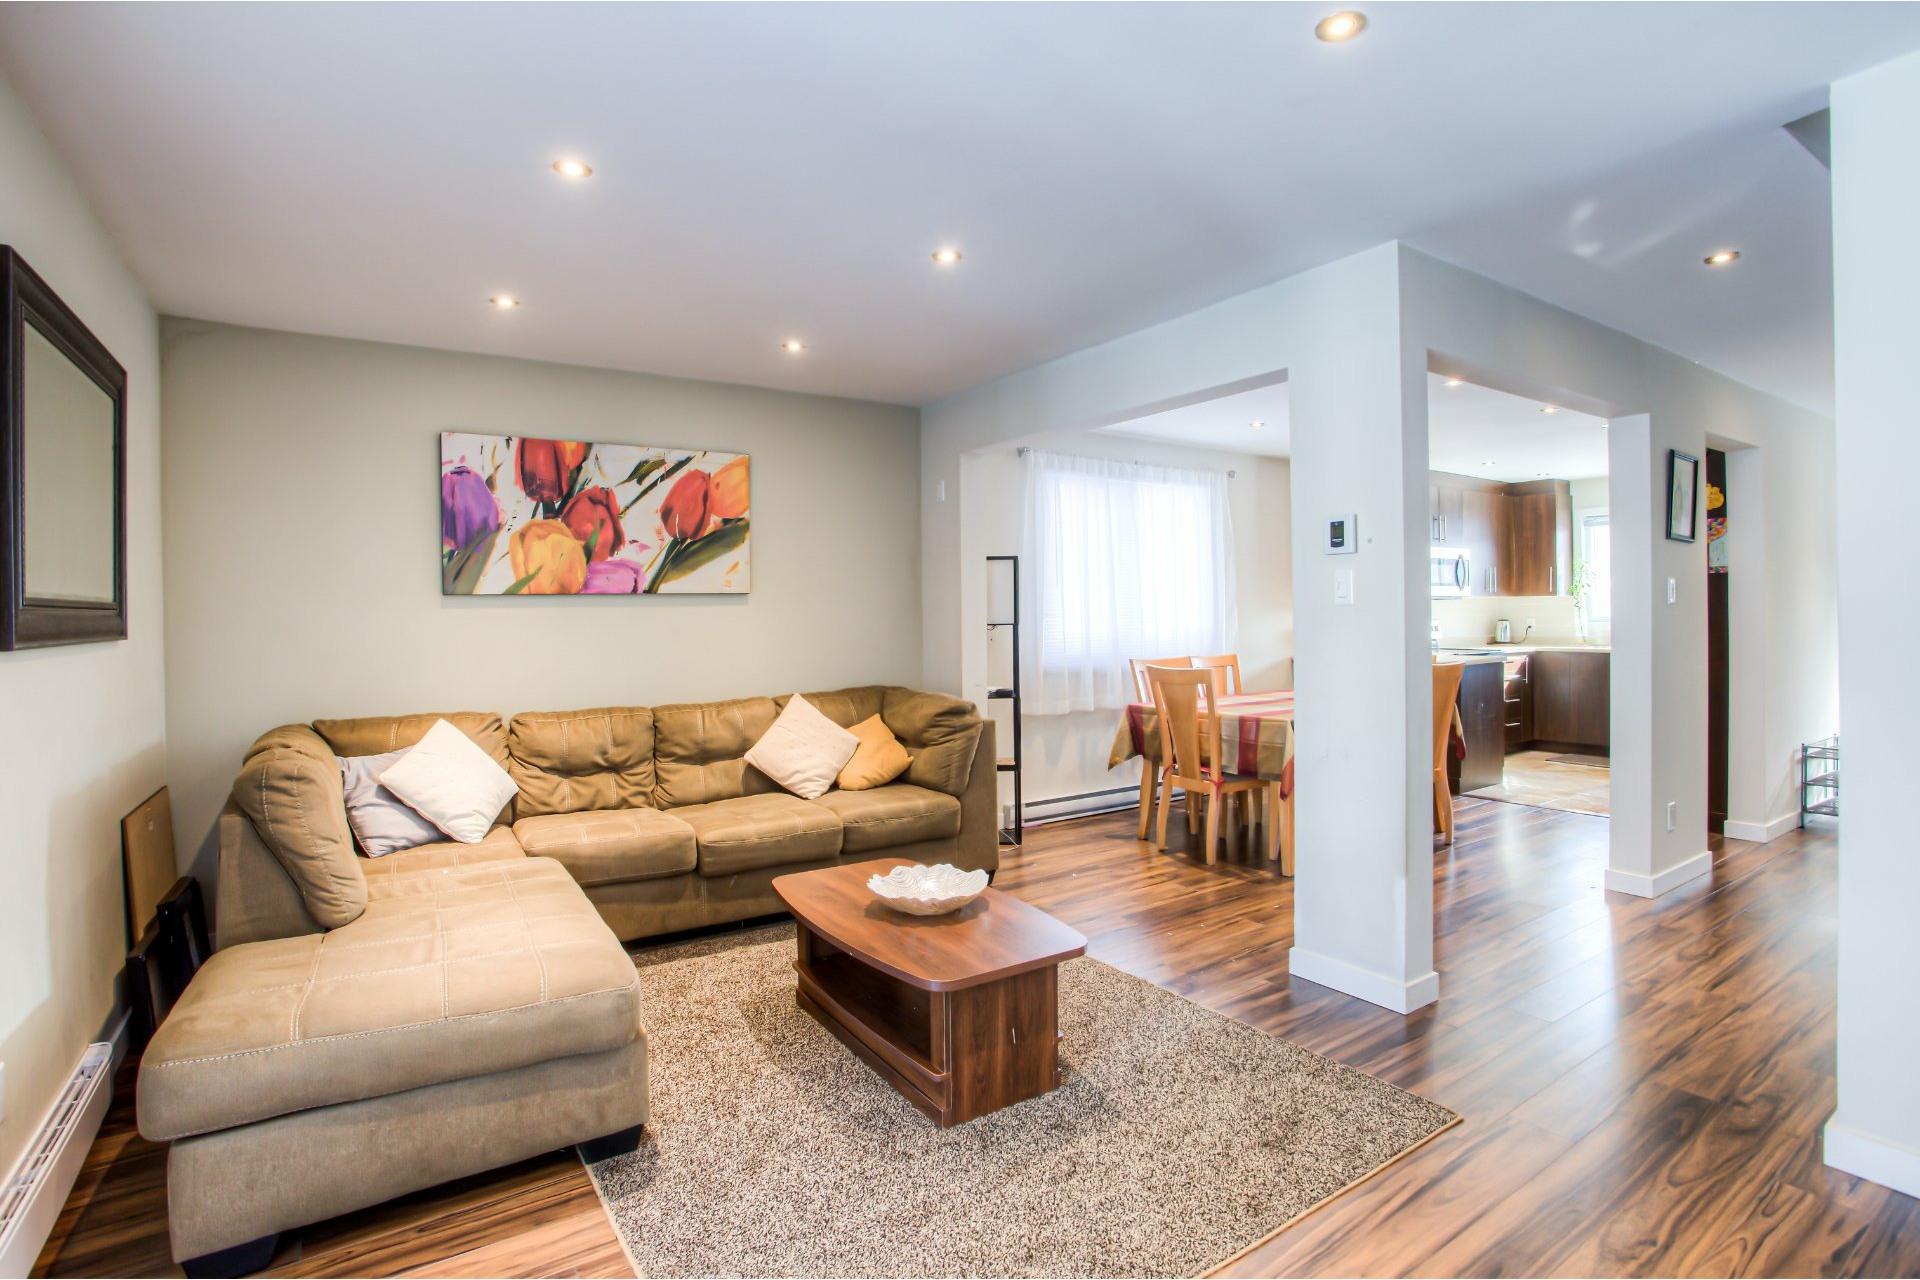 image 7 - House For rent Pierrefonds-Roxboro Montréal  - 9 rooms